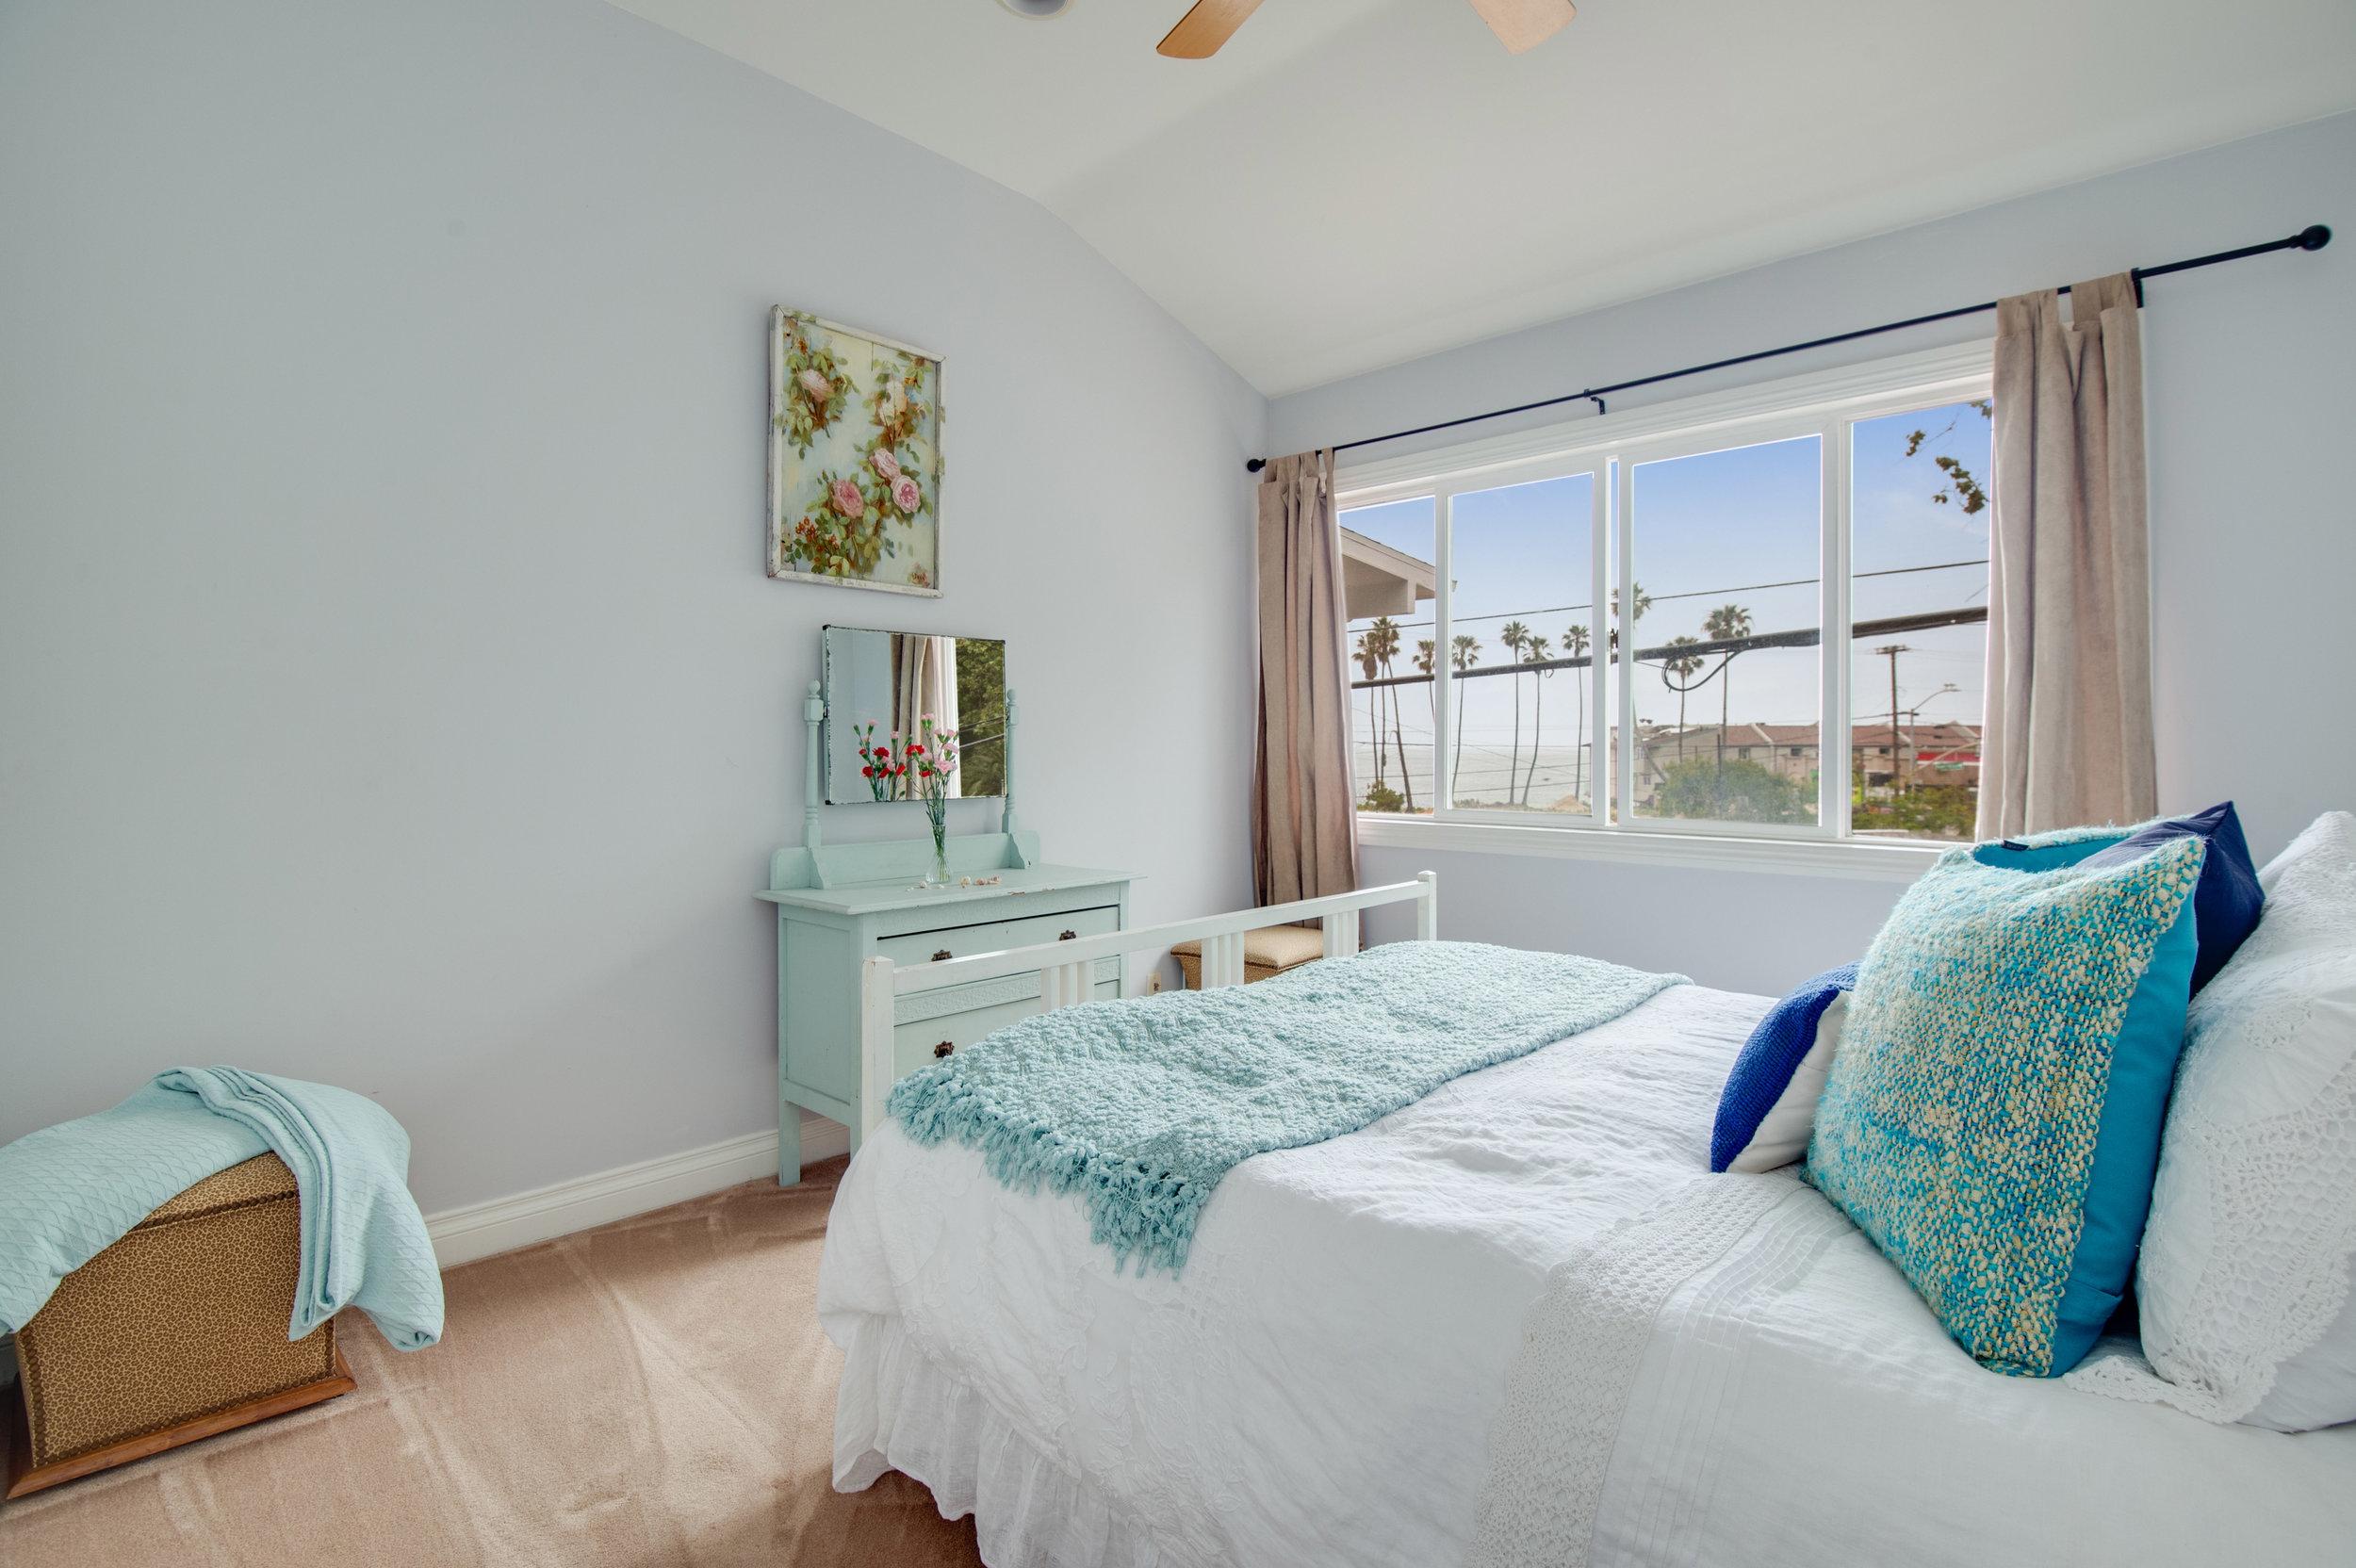 007 Bedrom 3950 Las Flores For Sale Lease The Malibu Life Team Luxury Real Estate.jpg